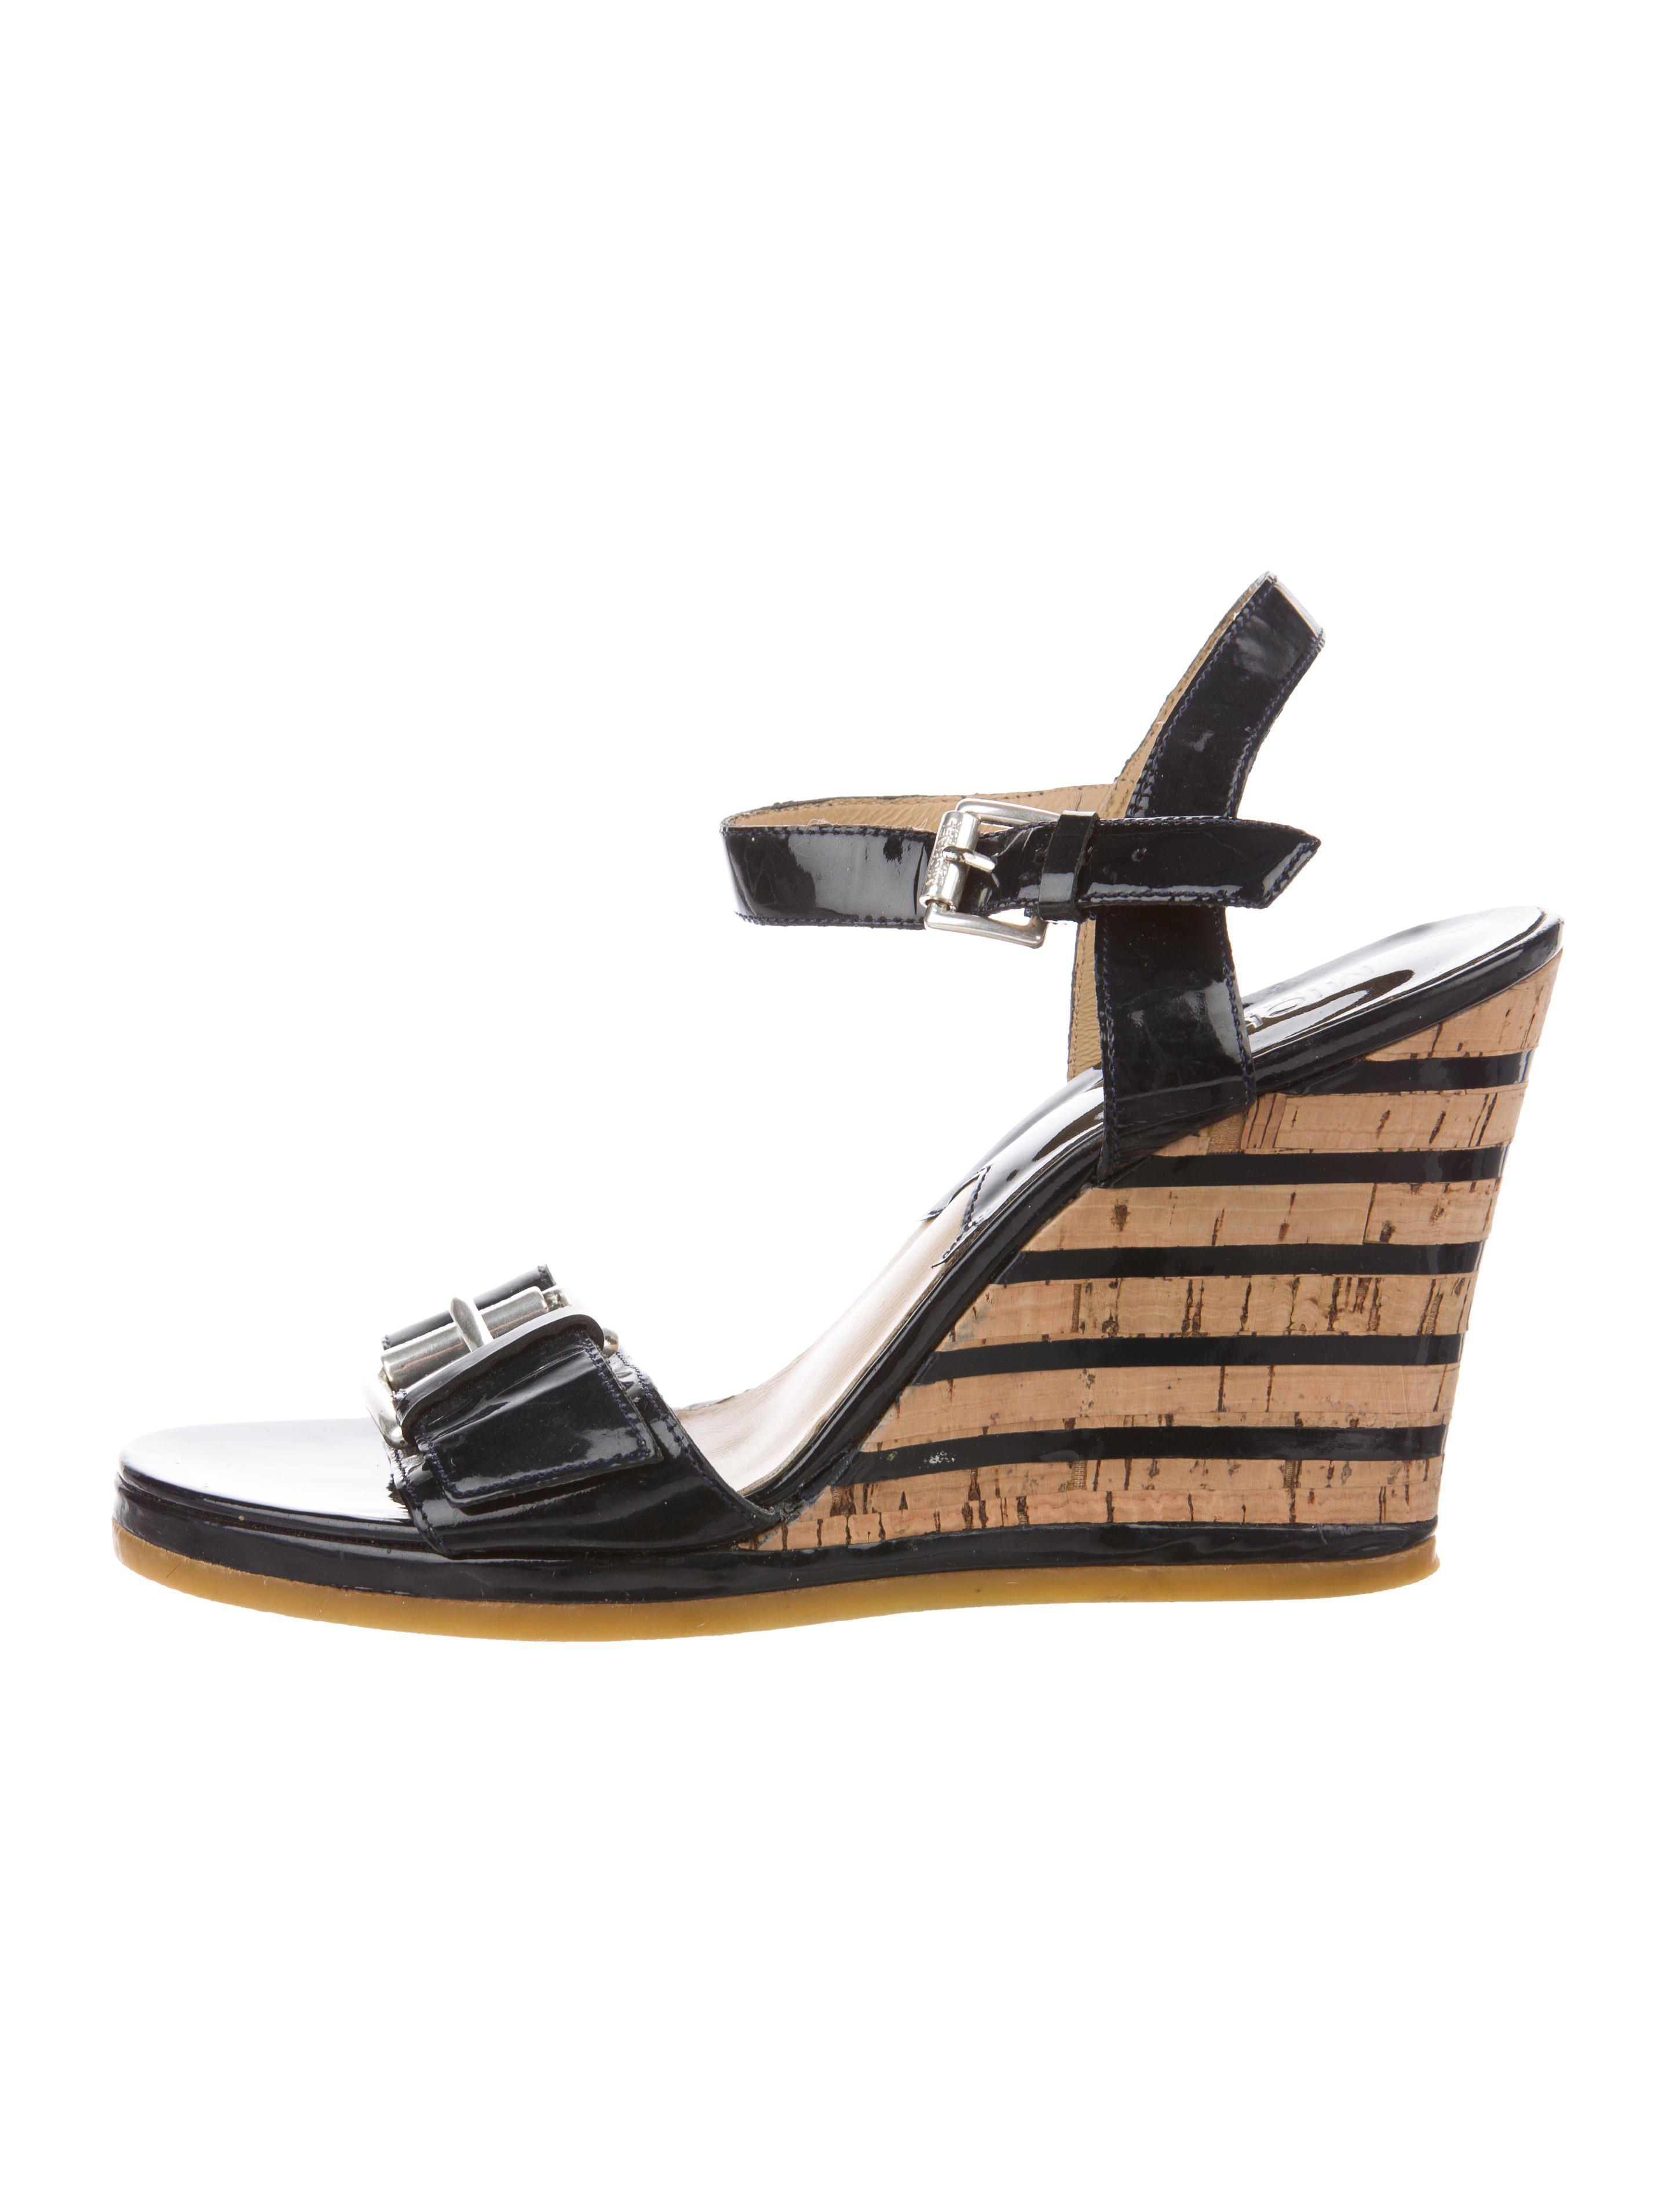 522ad0a0dfae MICHAEL Michael Kors. Women s Metallic Michael Kors Patent Leather Wedge  Sandals Navy